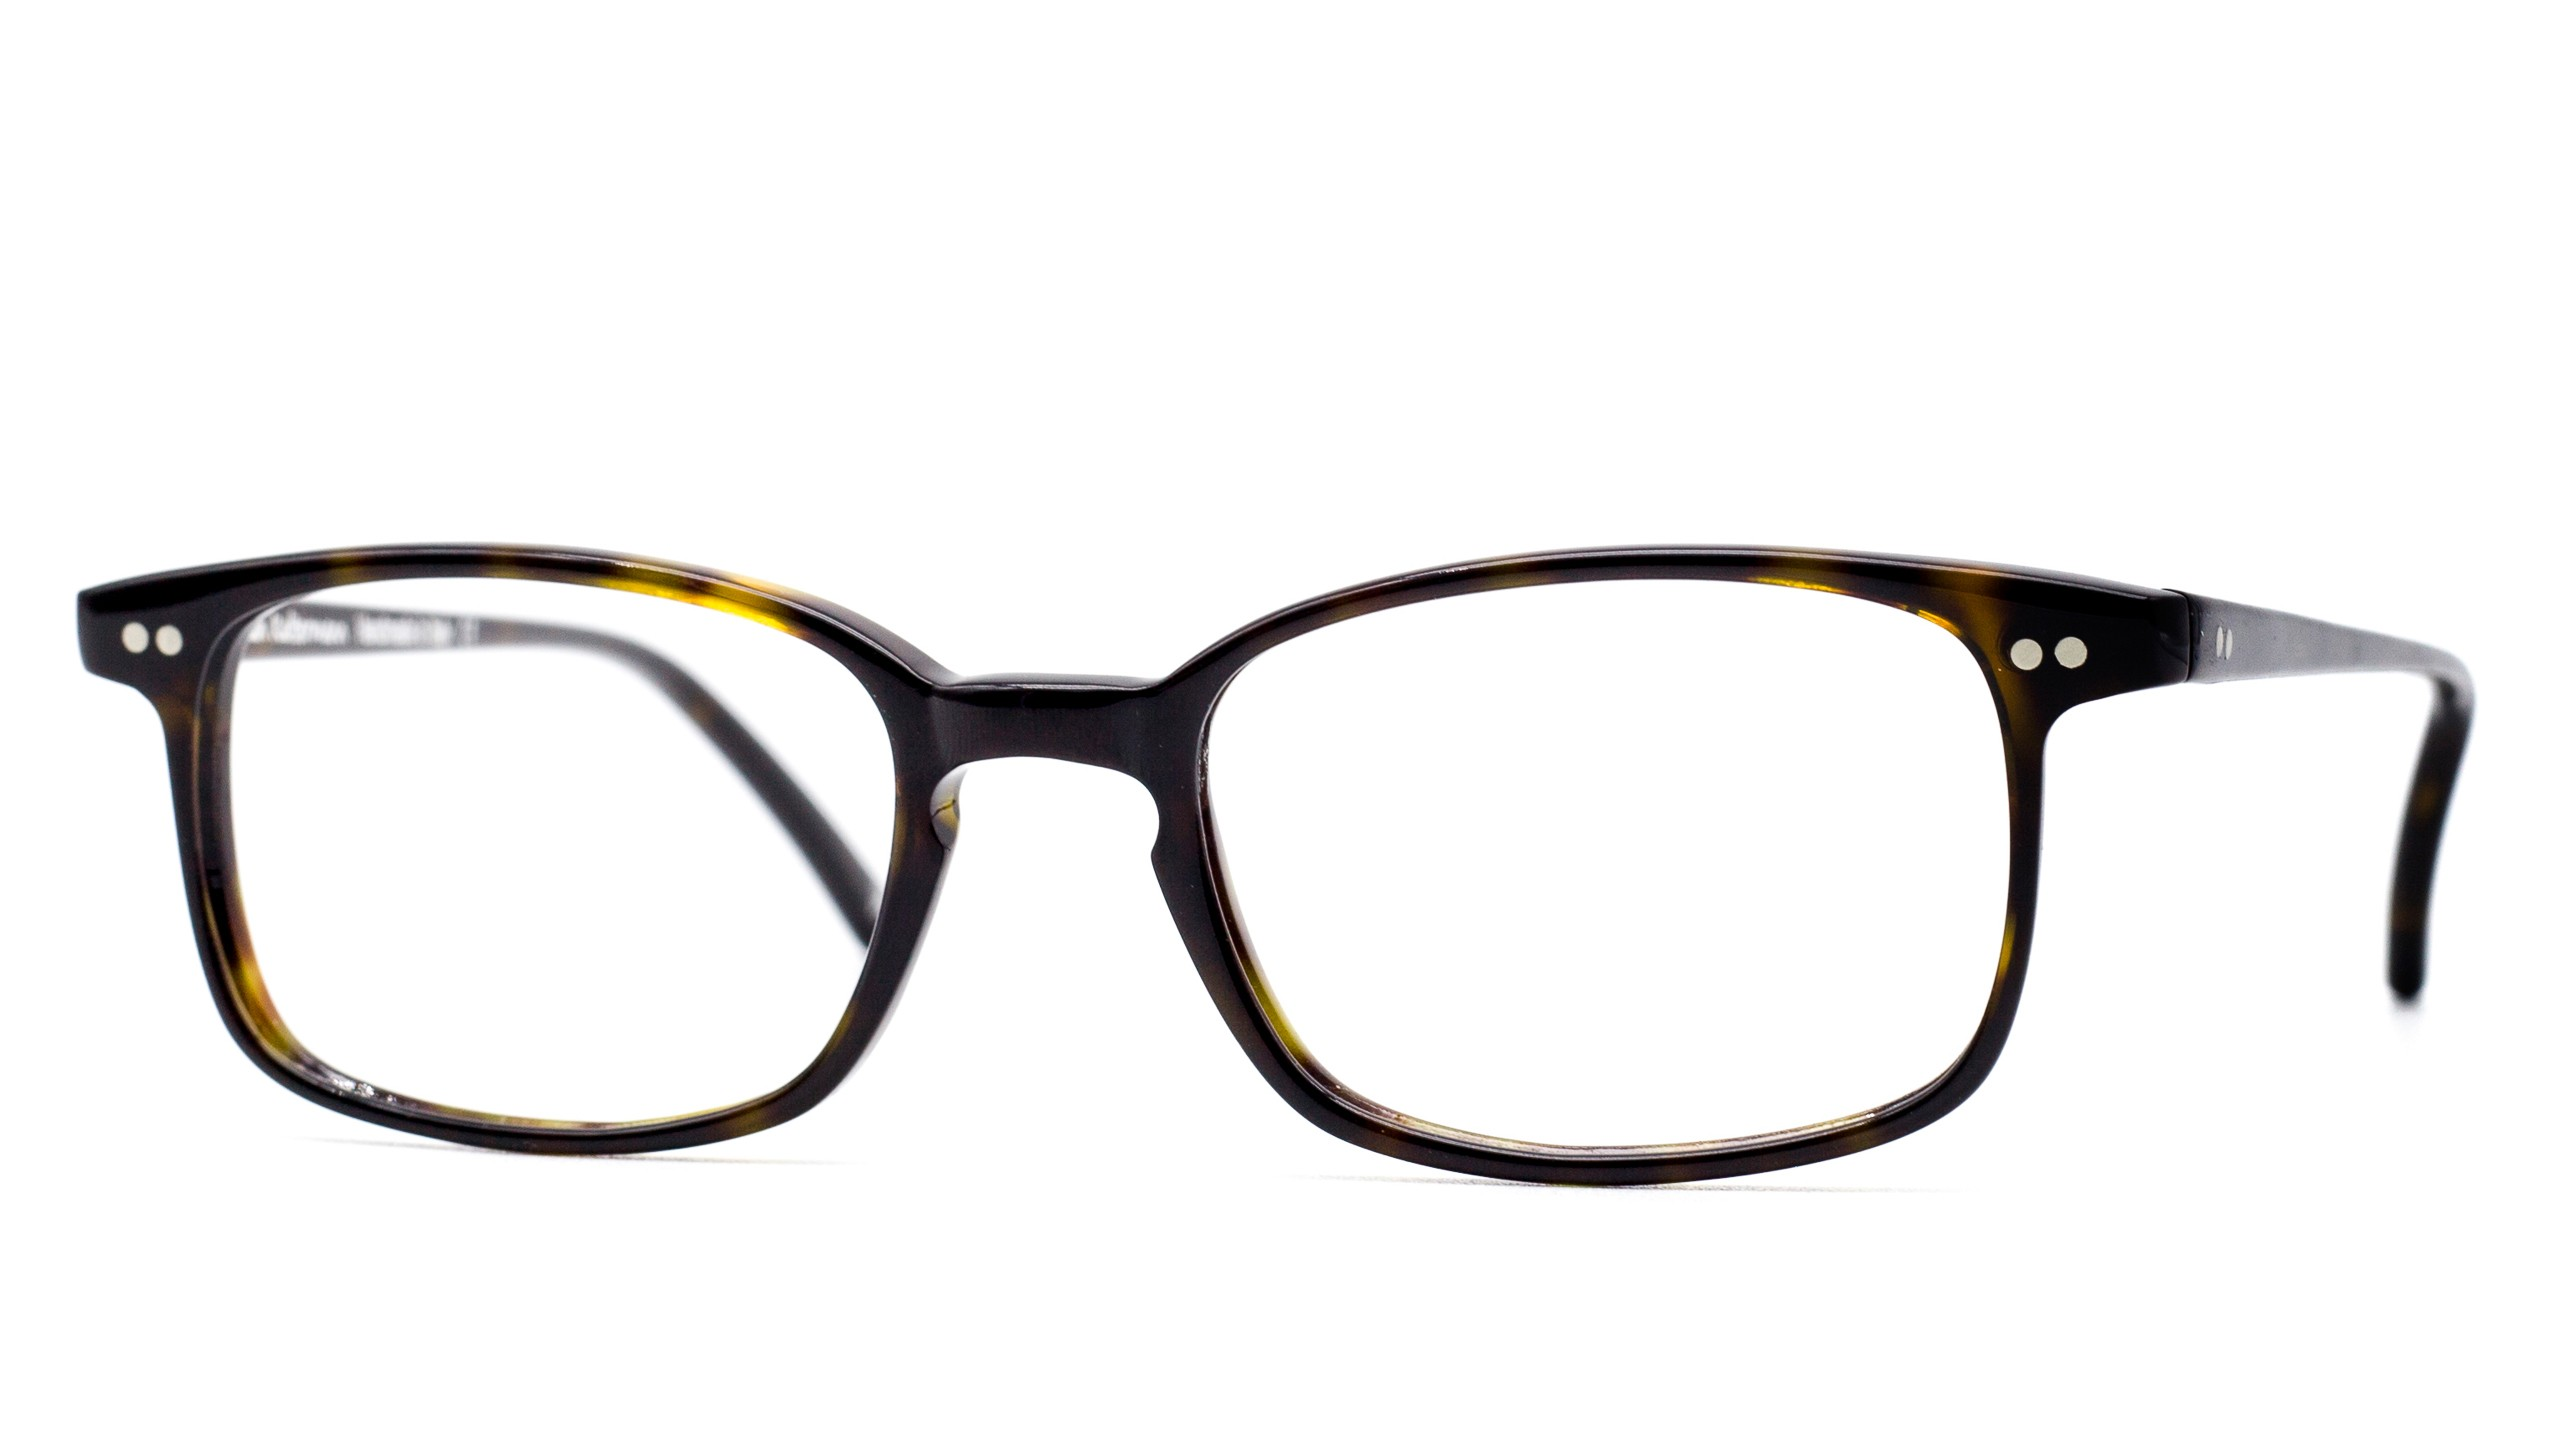 eyeglasses-Nathan-Kaltermann-made-in-Italy-Eddy-C02-Vista2